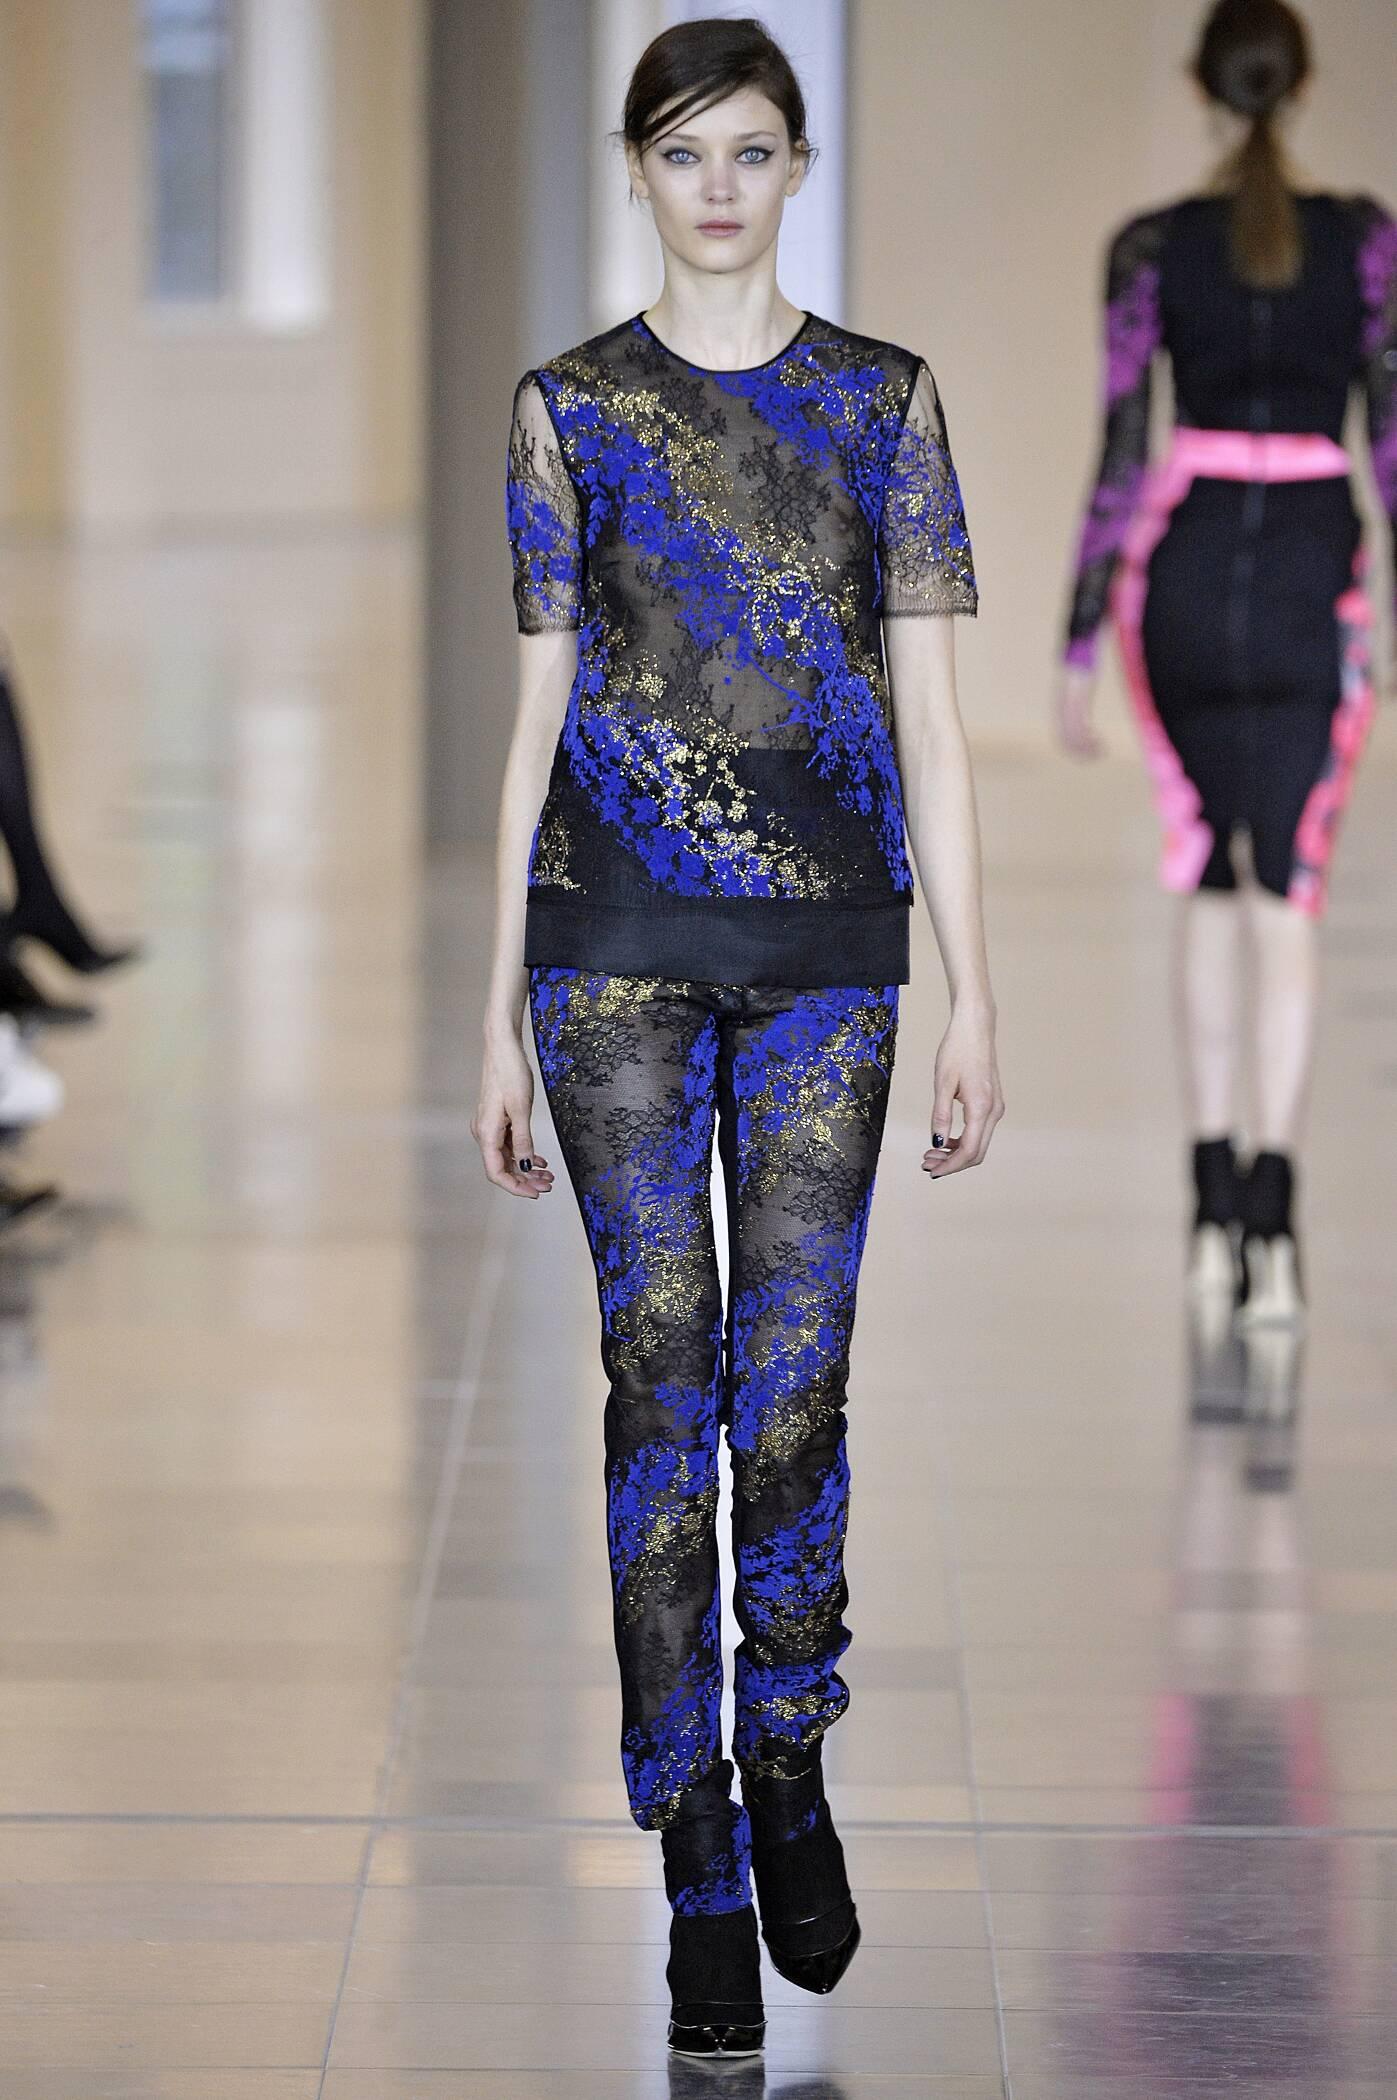 Fashion Man Model Antonio Berardi Collection Catwalk